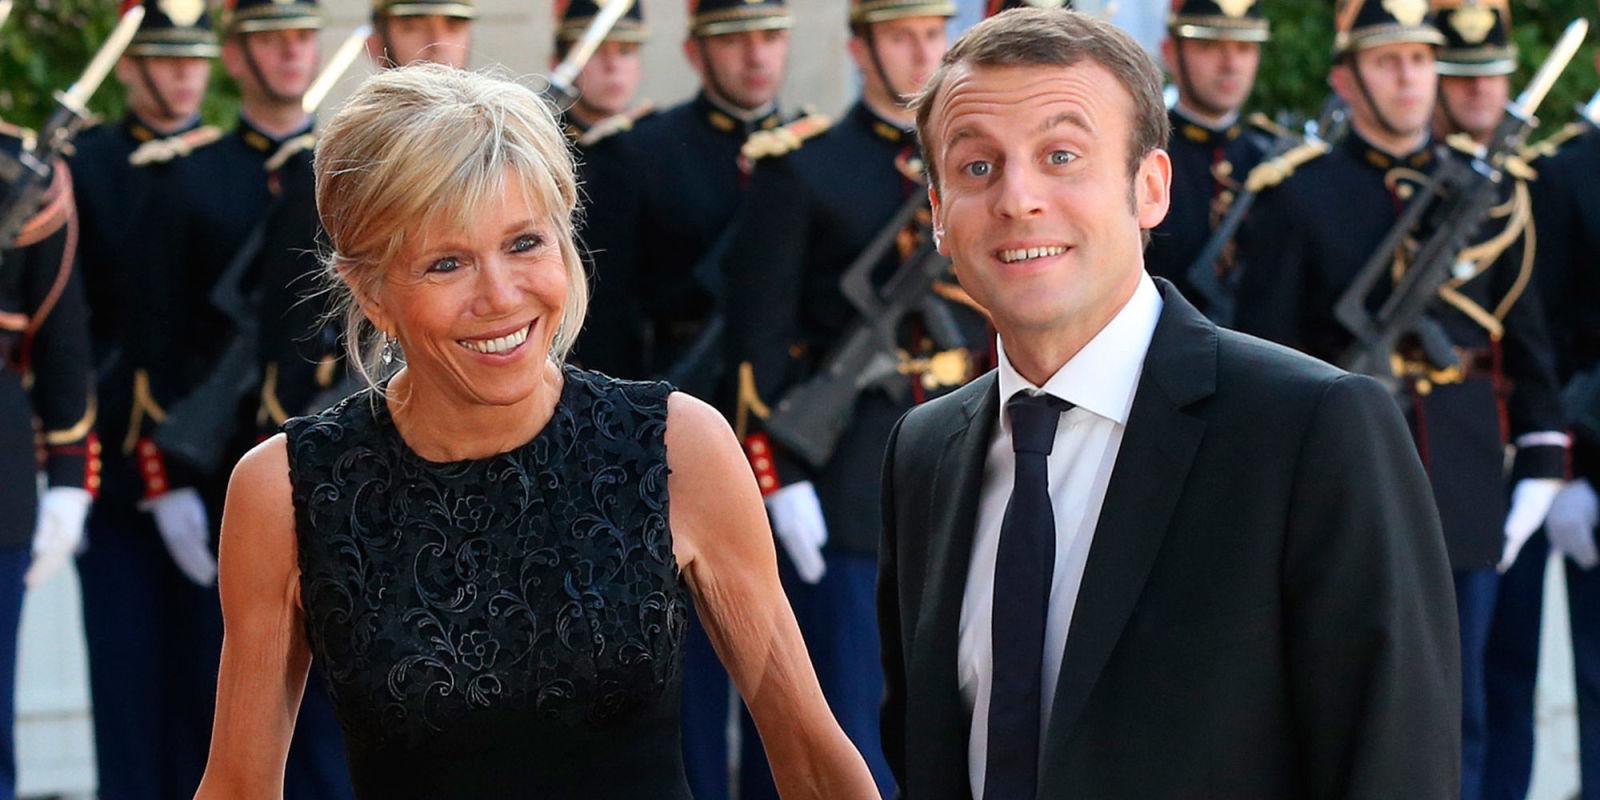 Emmanuel Macron on his wife's age – Emmanuel Macron ...